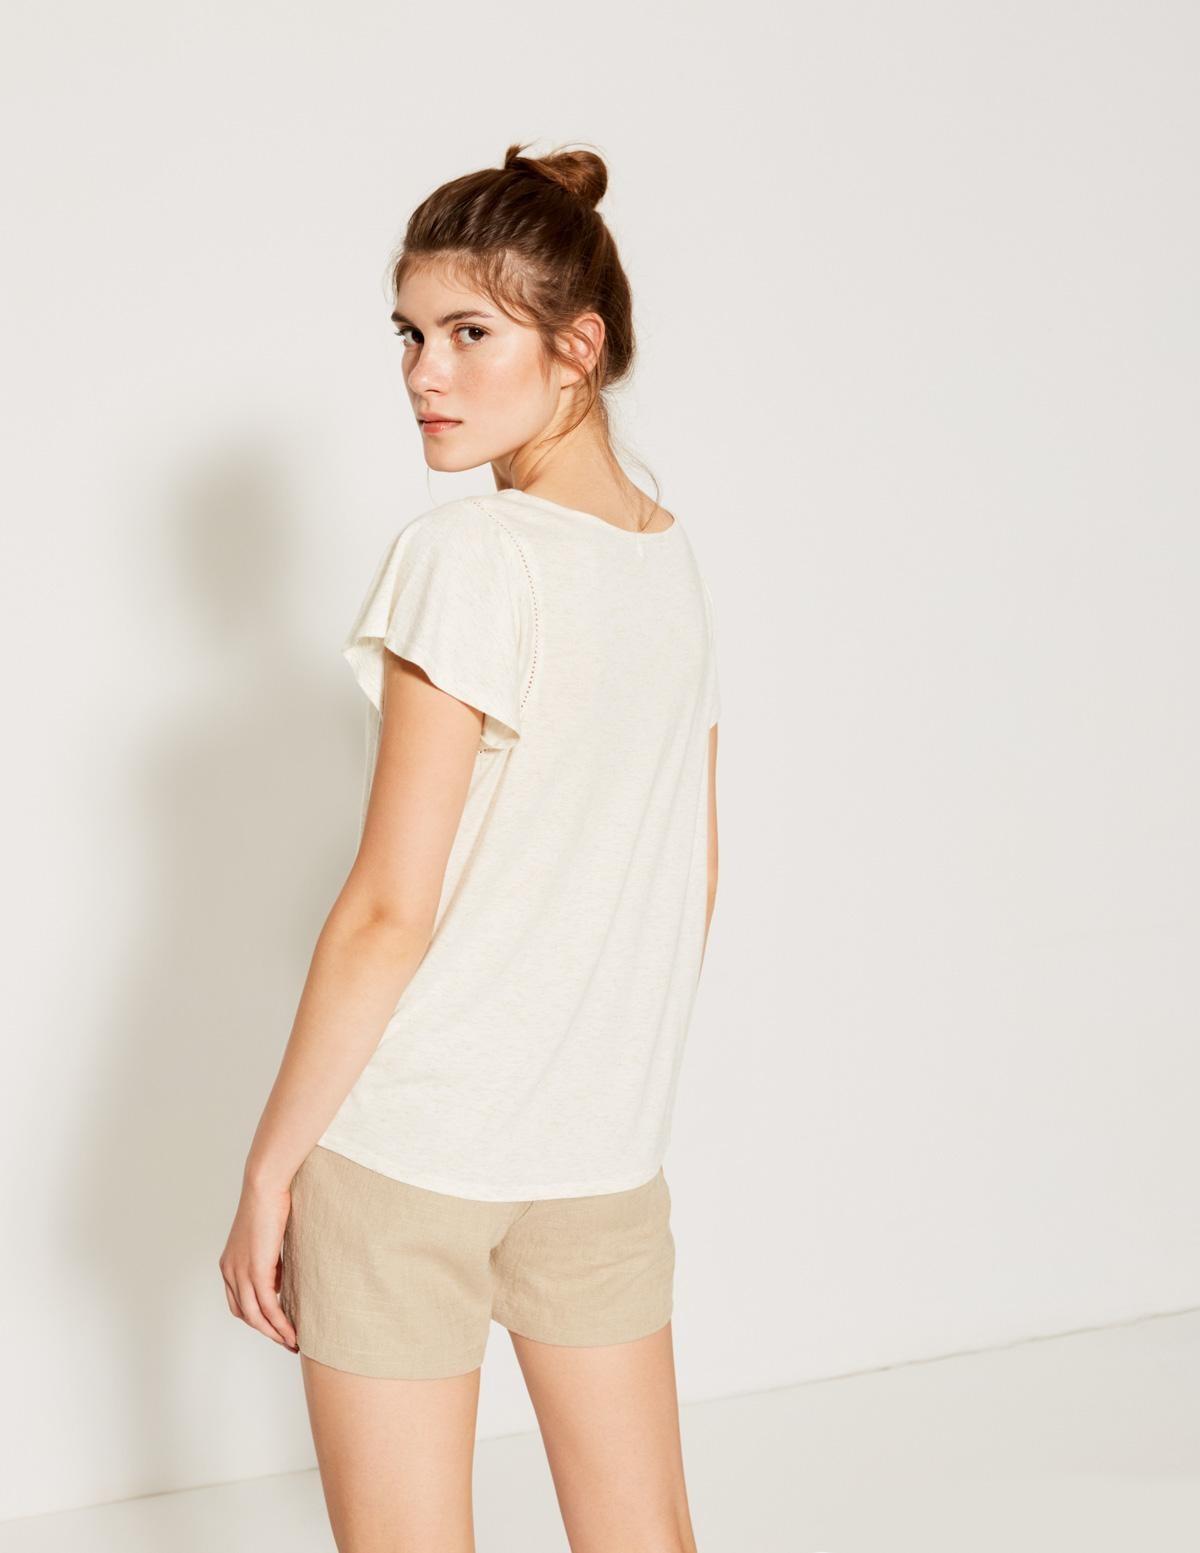 Camiseta melange brillos - Ítem2